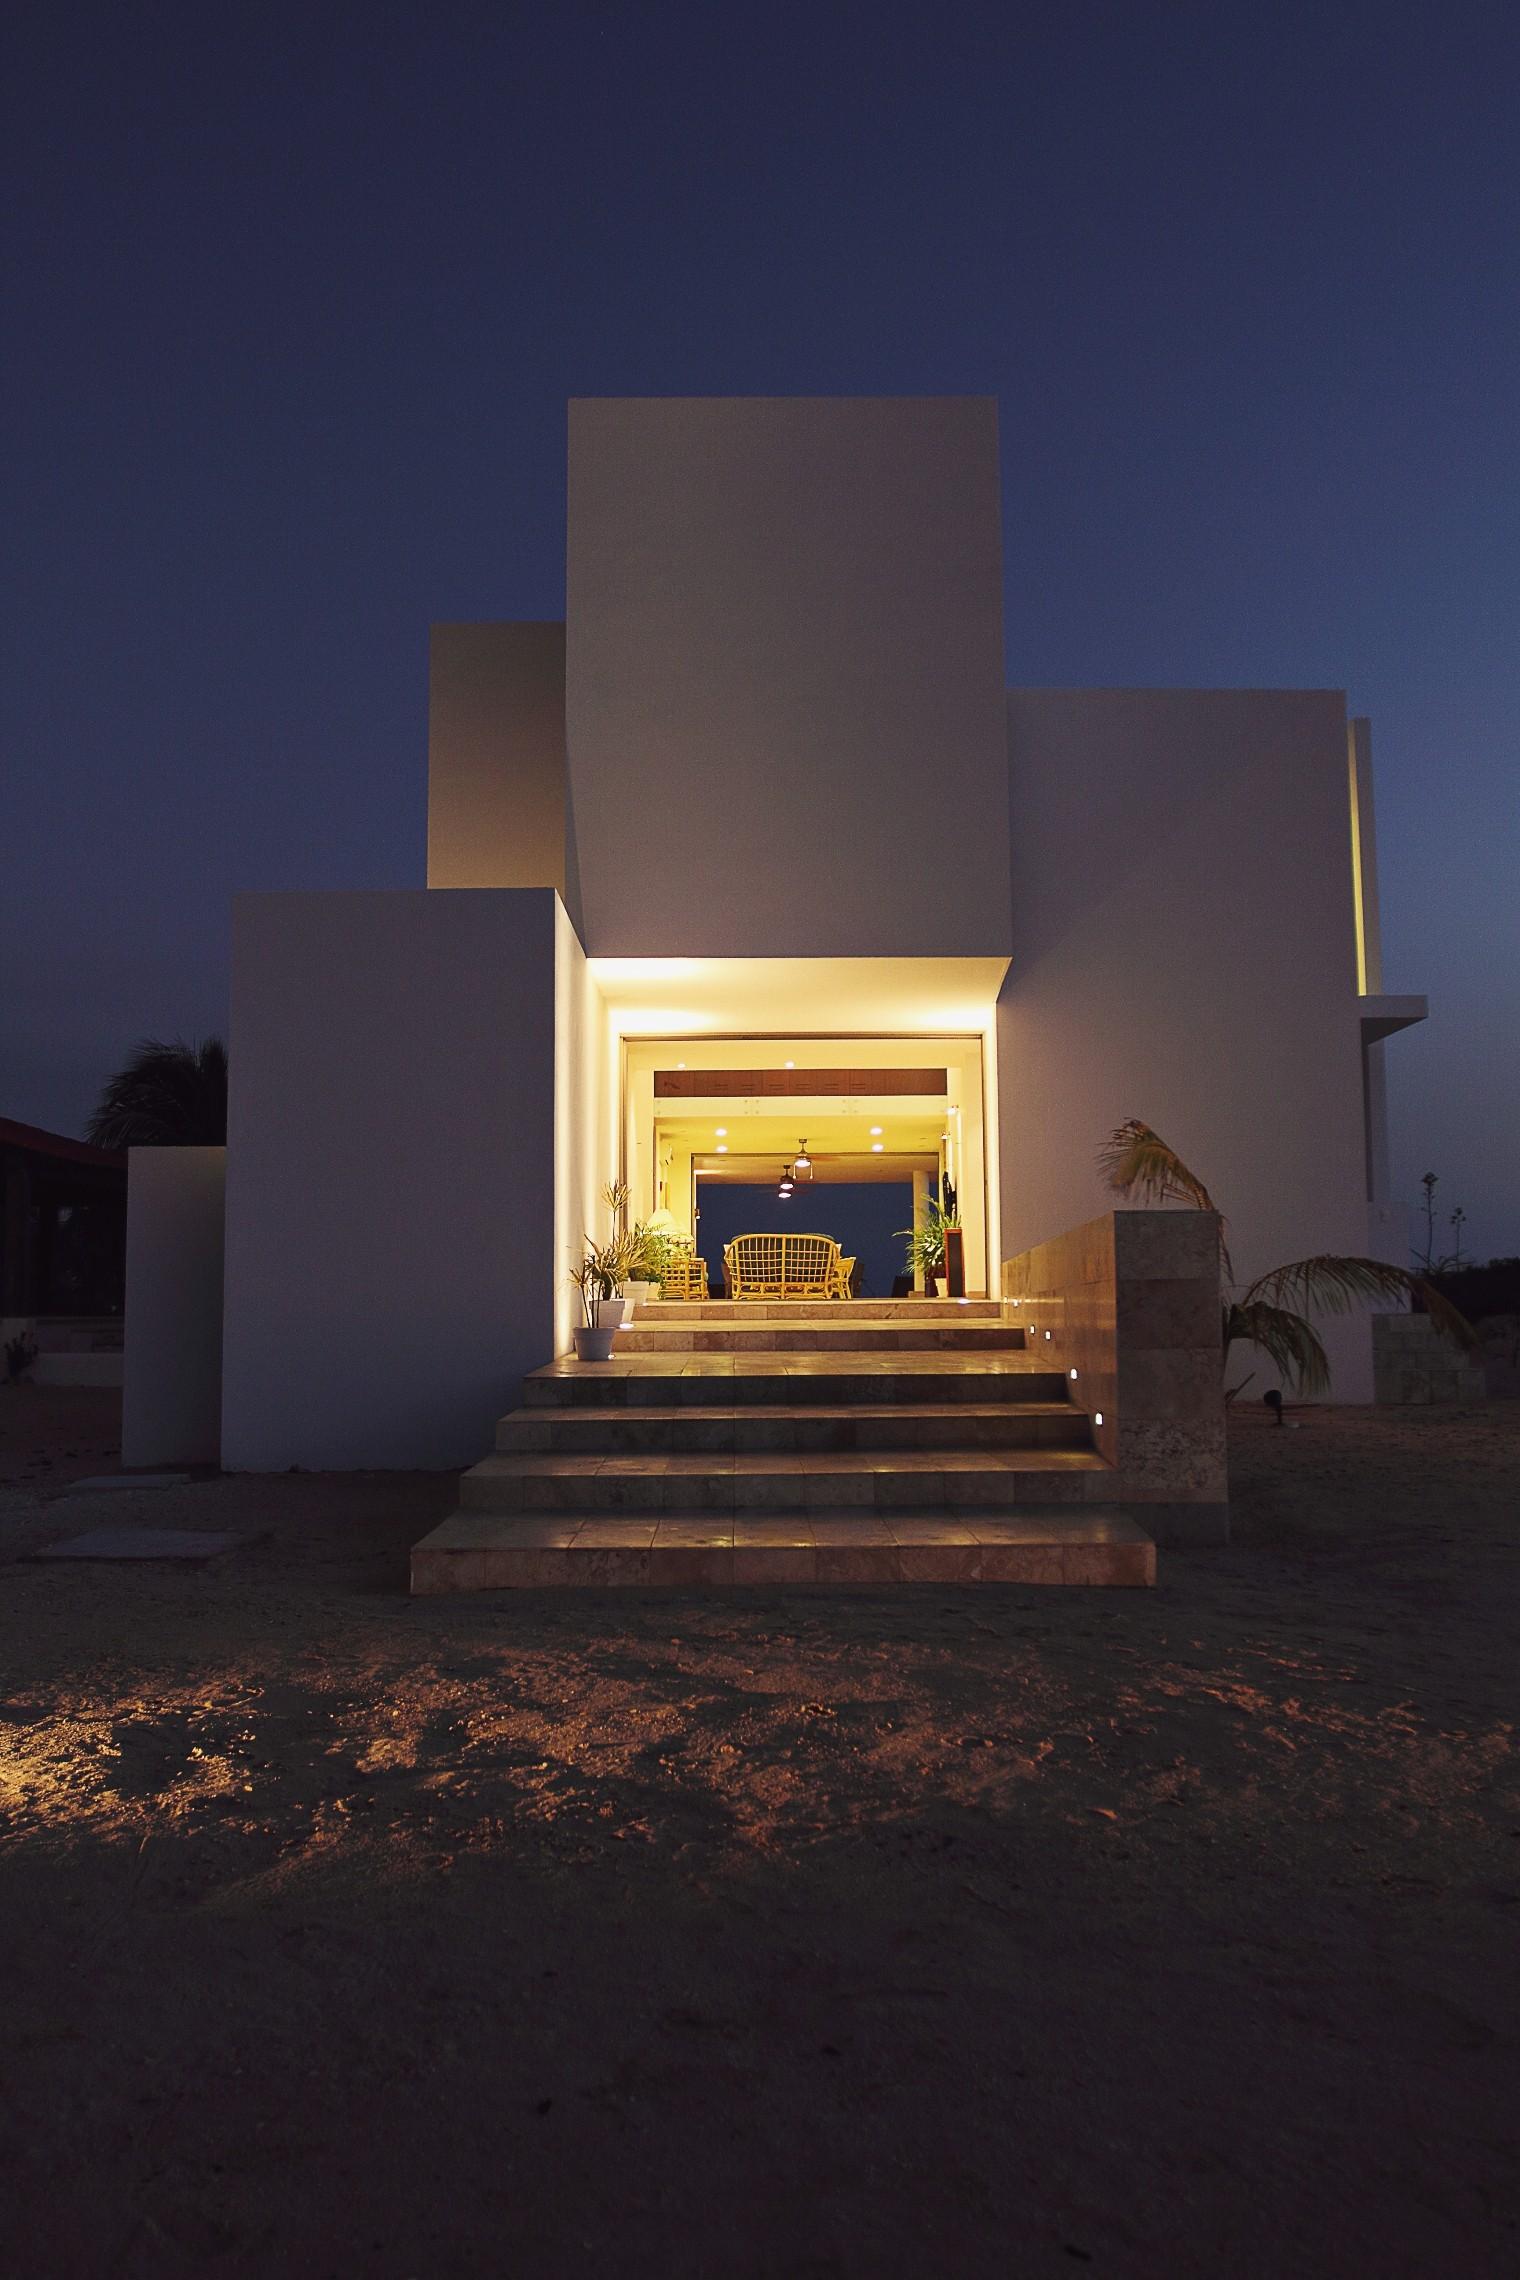 Tuunich Kanab / Seijo Peon Arquitectos